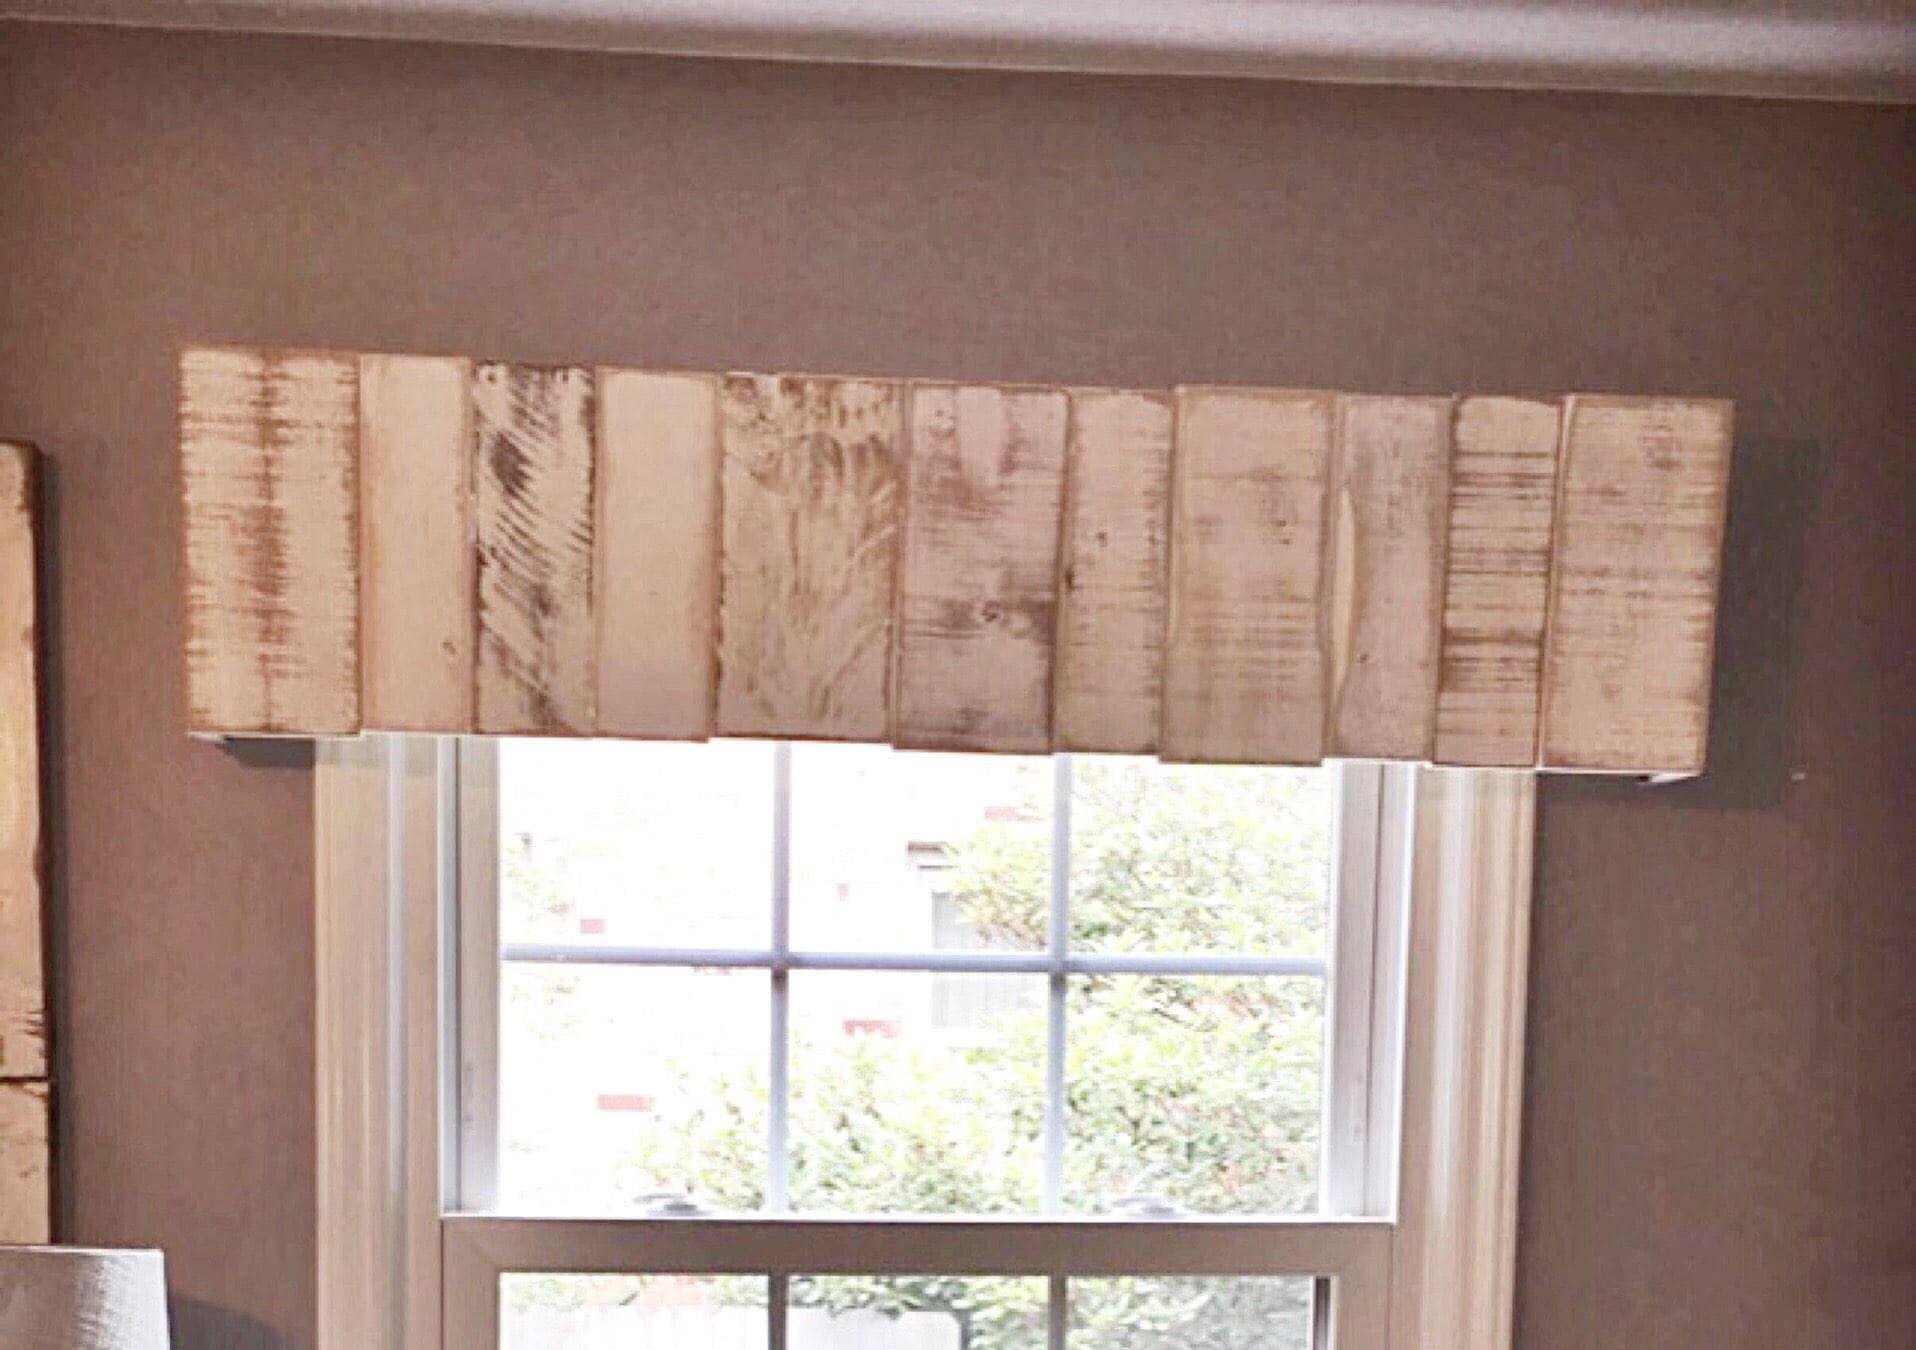 Rustic Wooden Valance Rustic Wooden Cornice Wooden Window